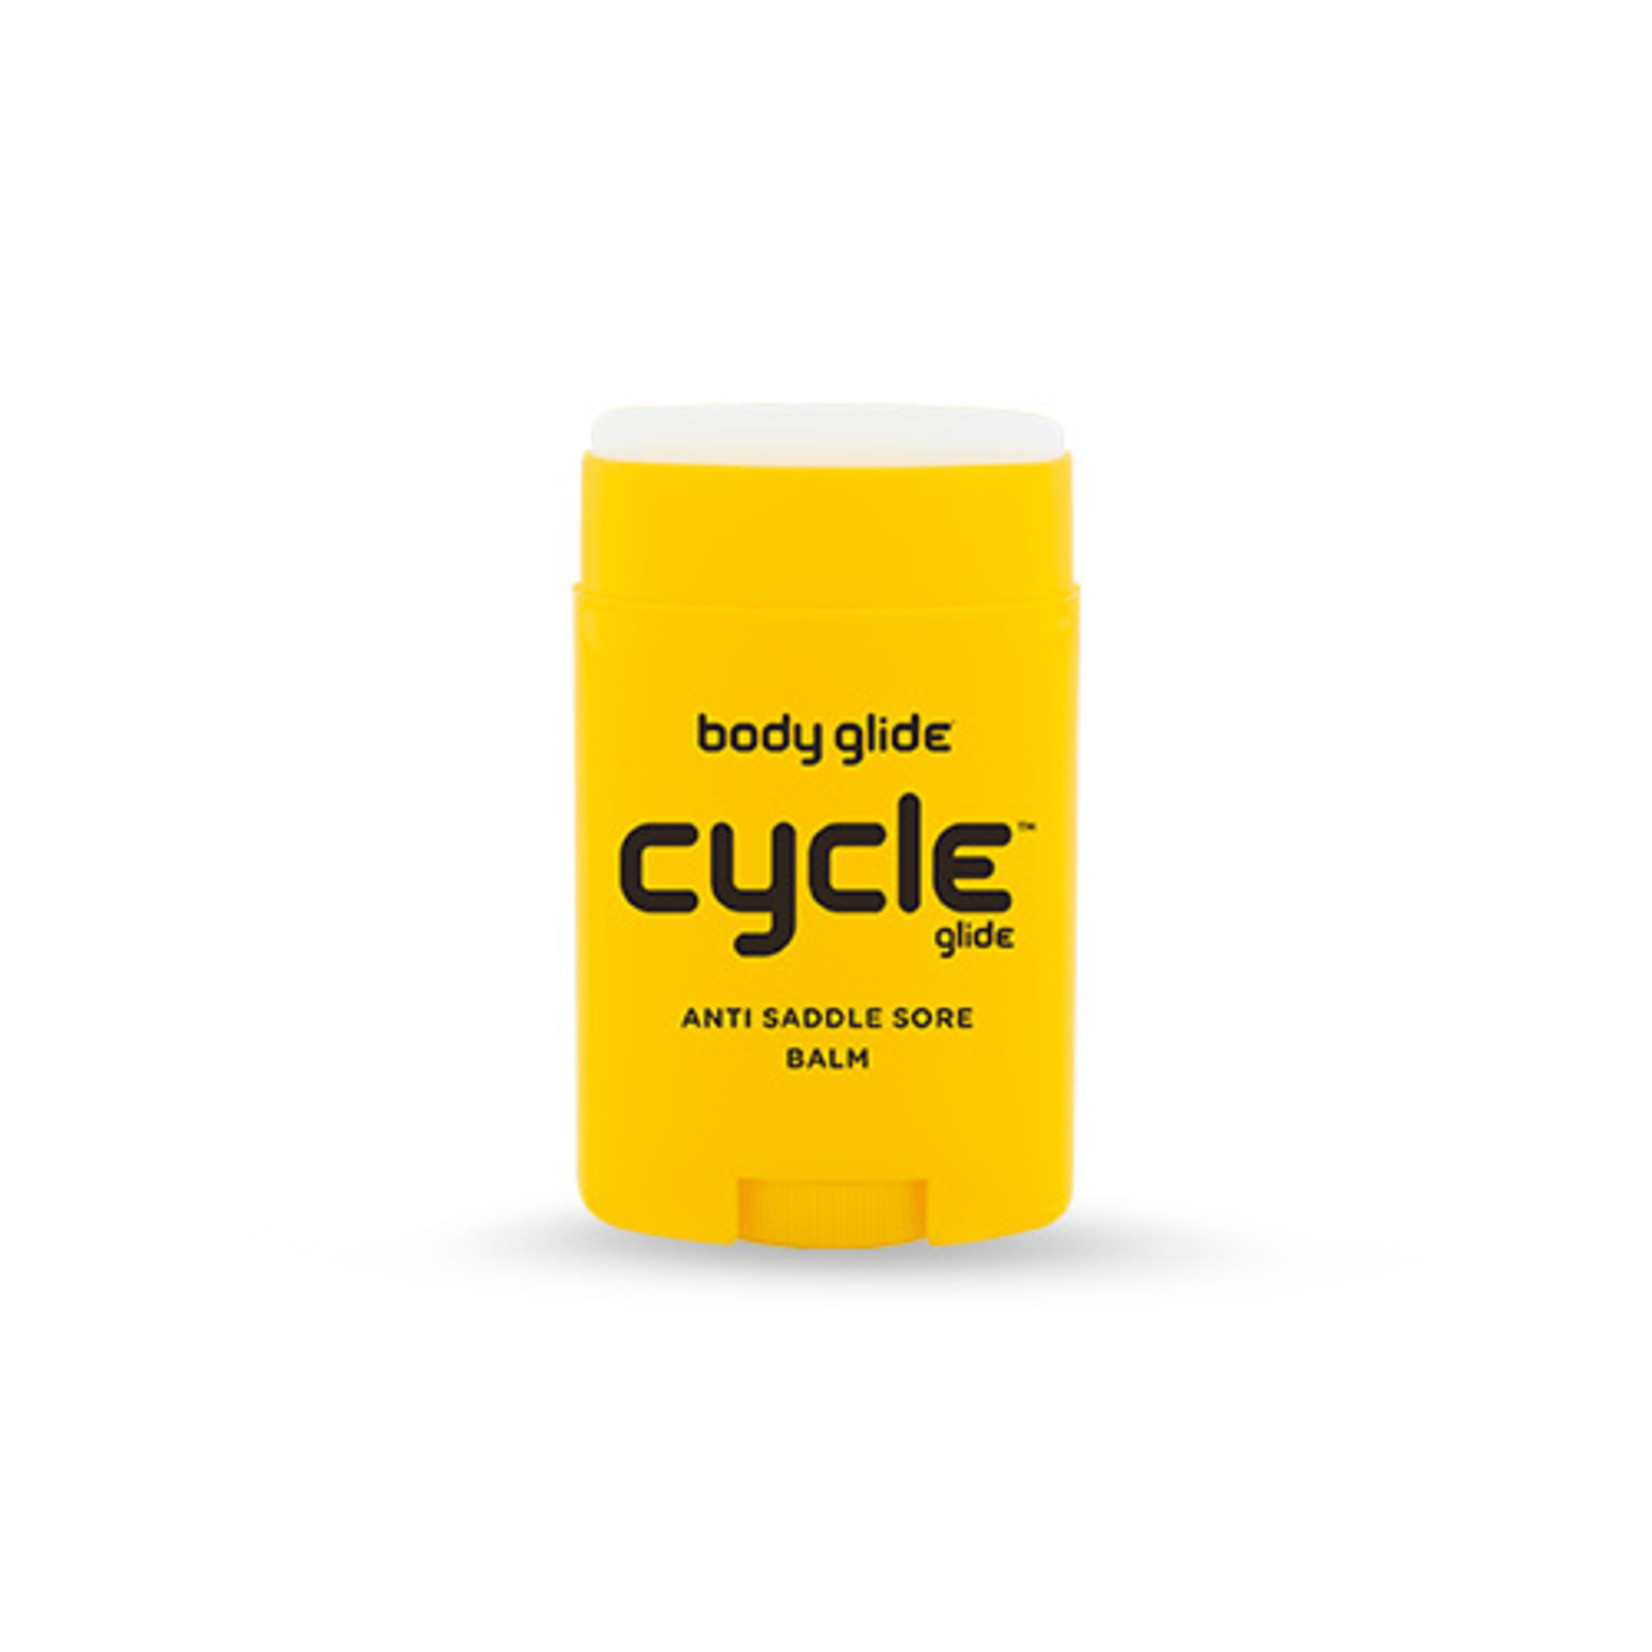 Body Glide BODY GLIDE CYCLE